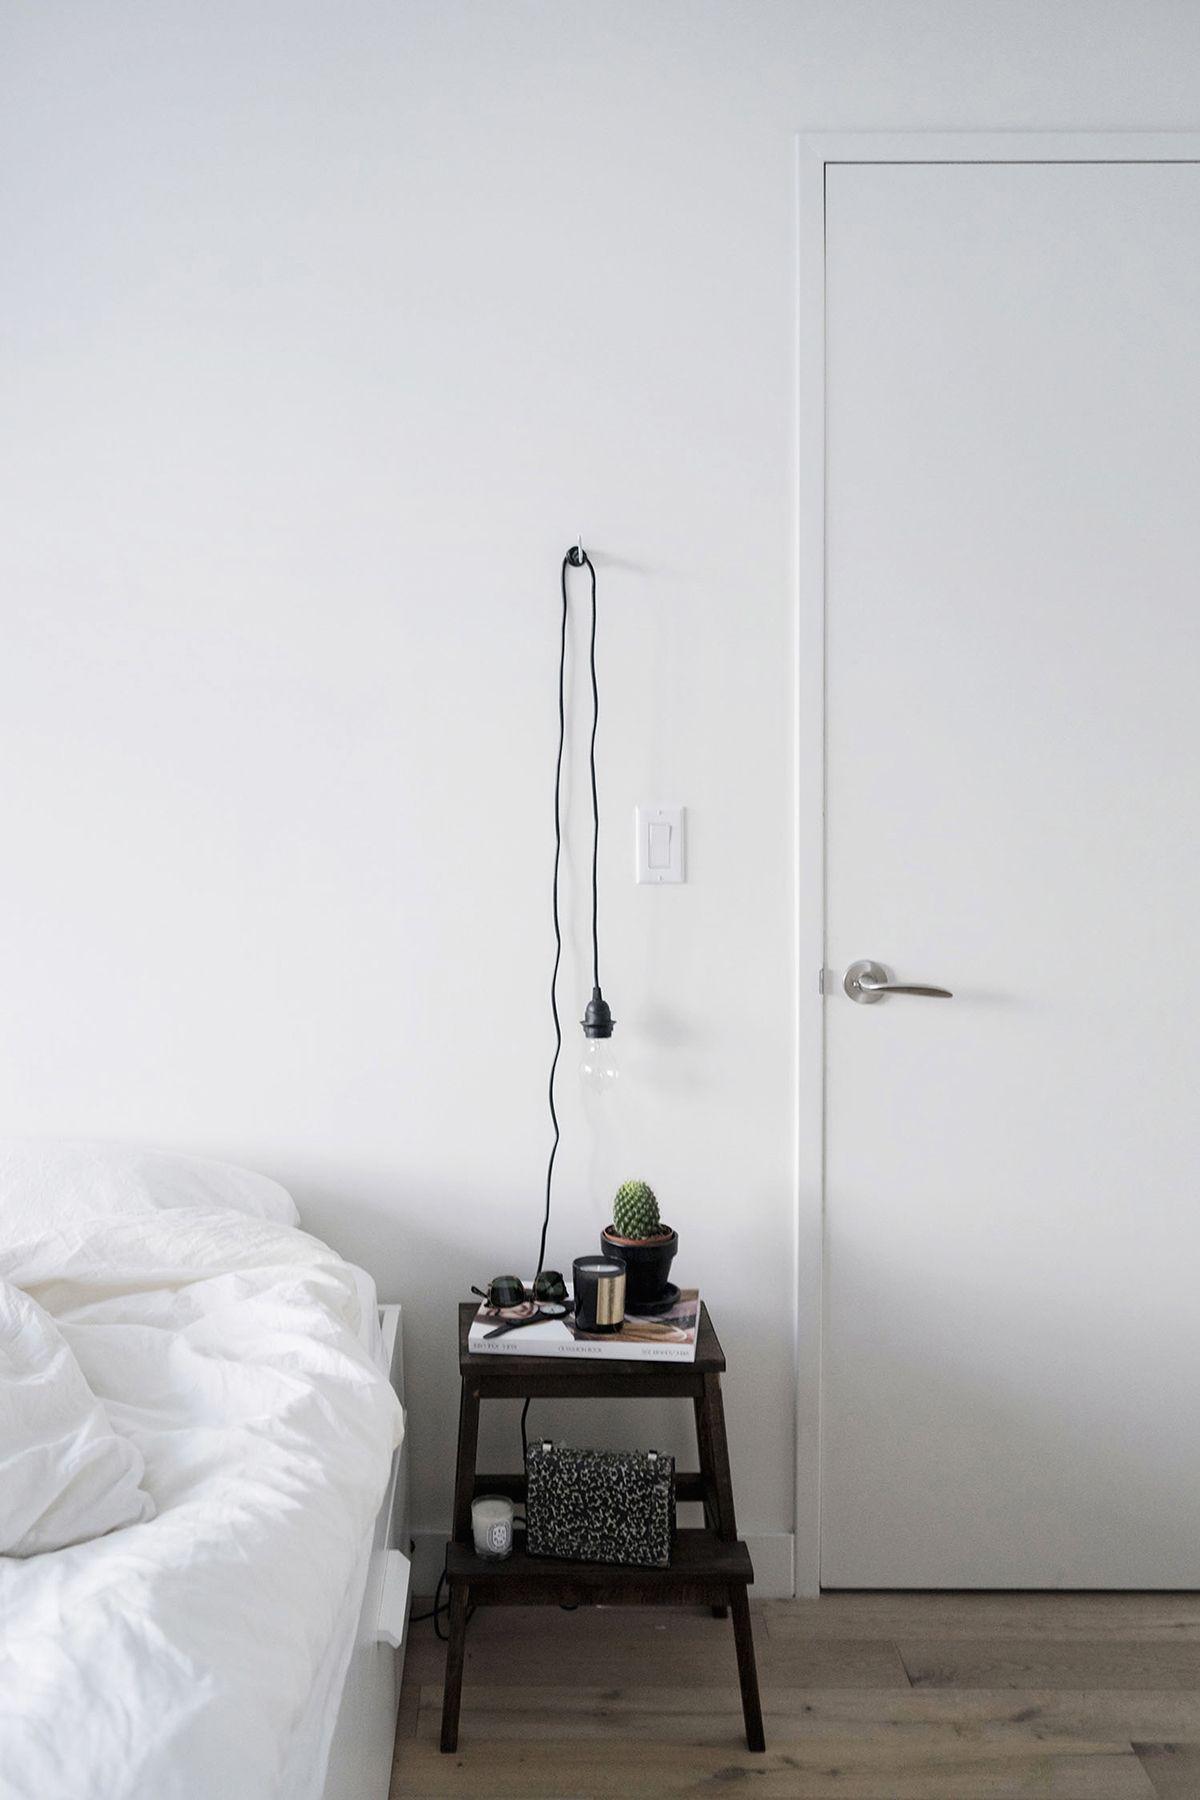 Ikea Bekvam stool side table DIY + hanging lightbulb   Scandinavian, industrial bedroom in New York City